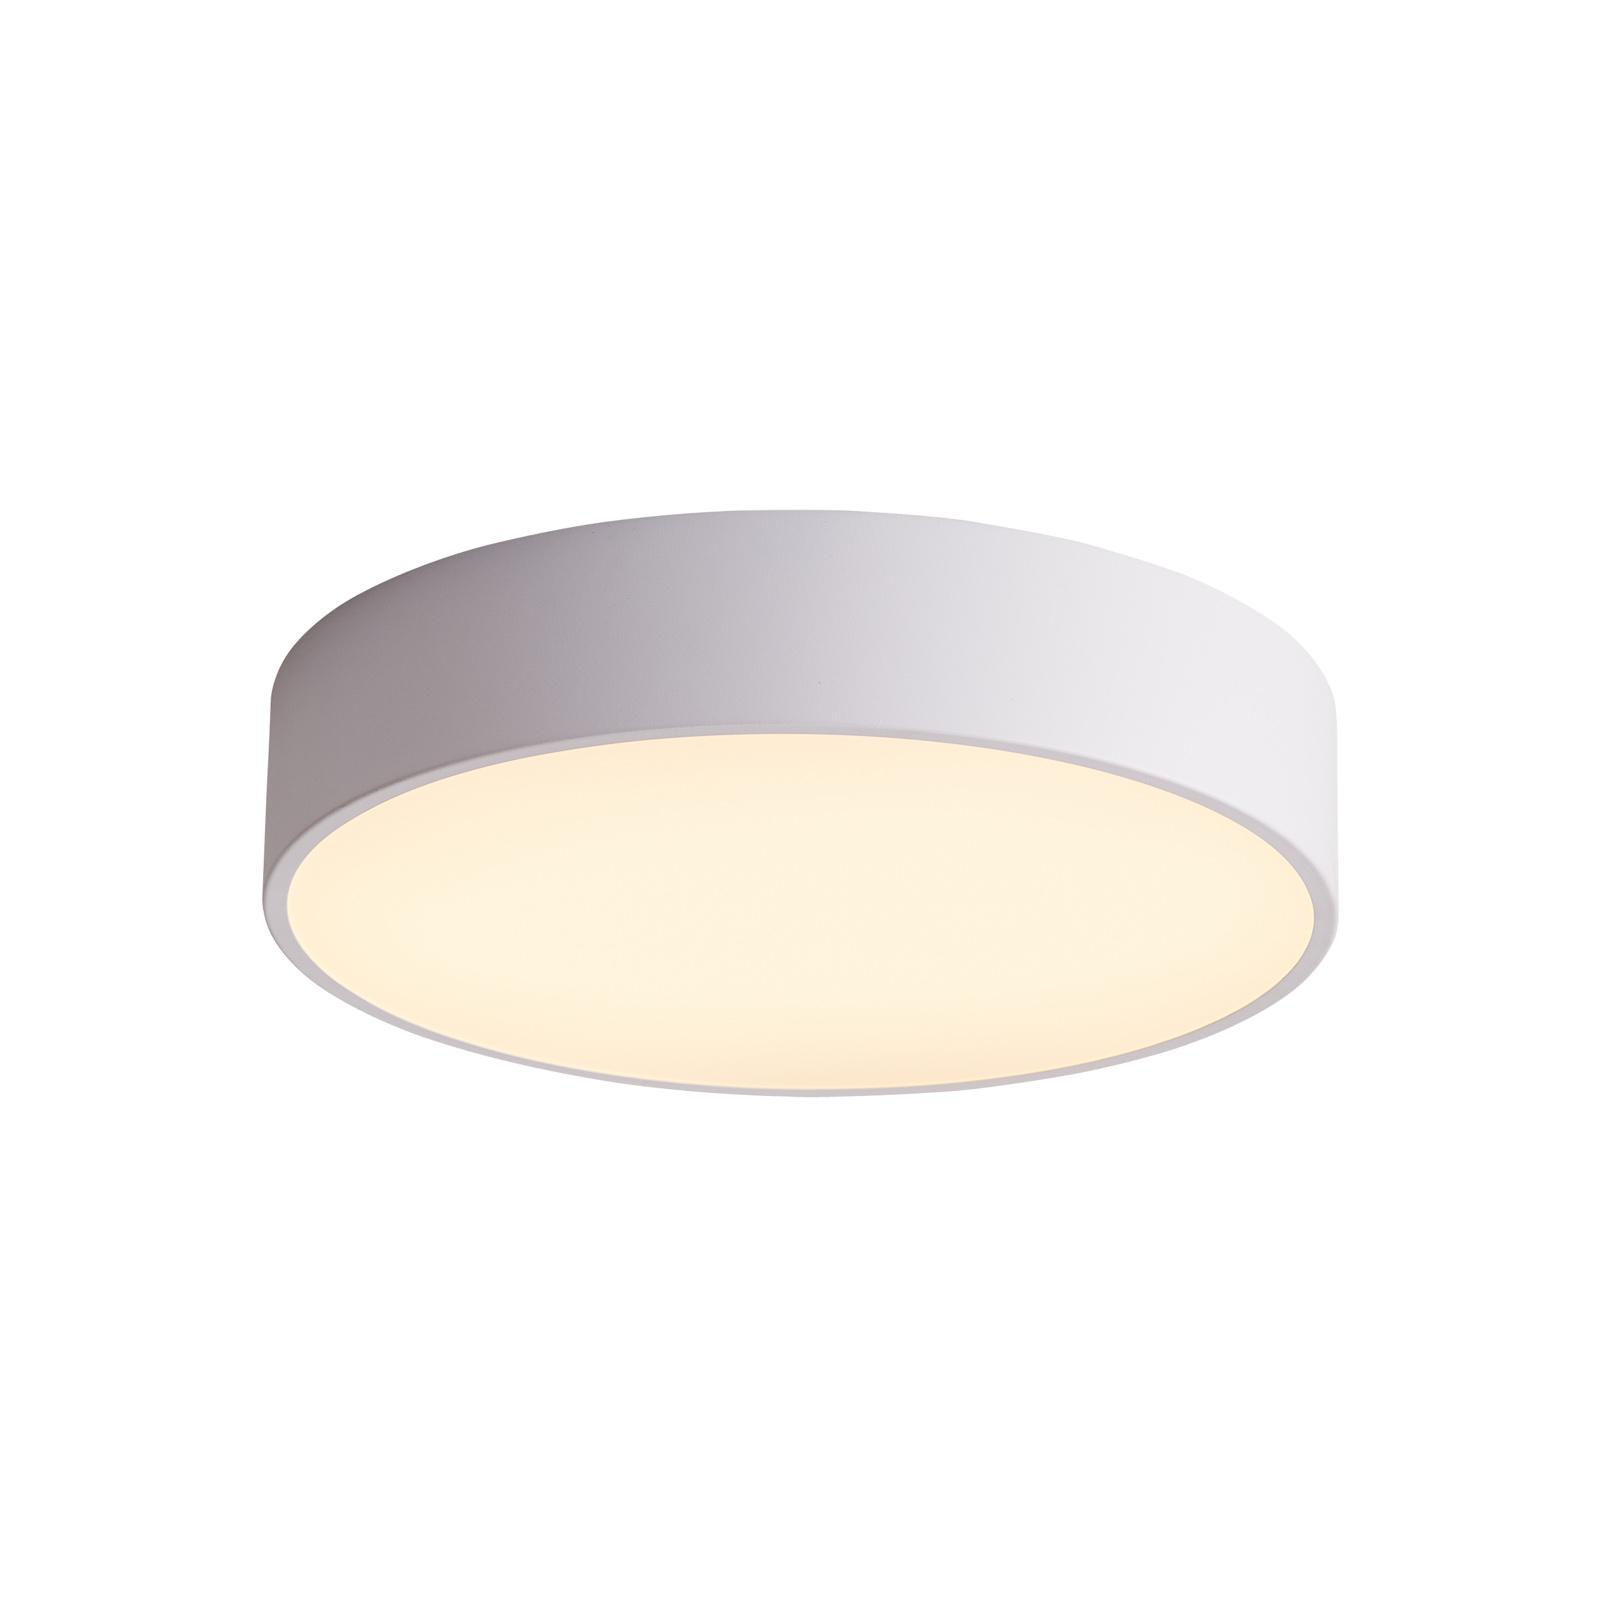 Arcchio Noabelle lampa sufitowa LED, biała, 80 cm